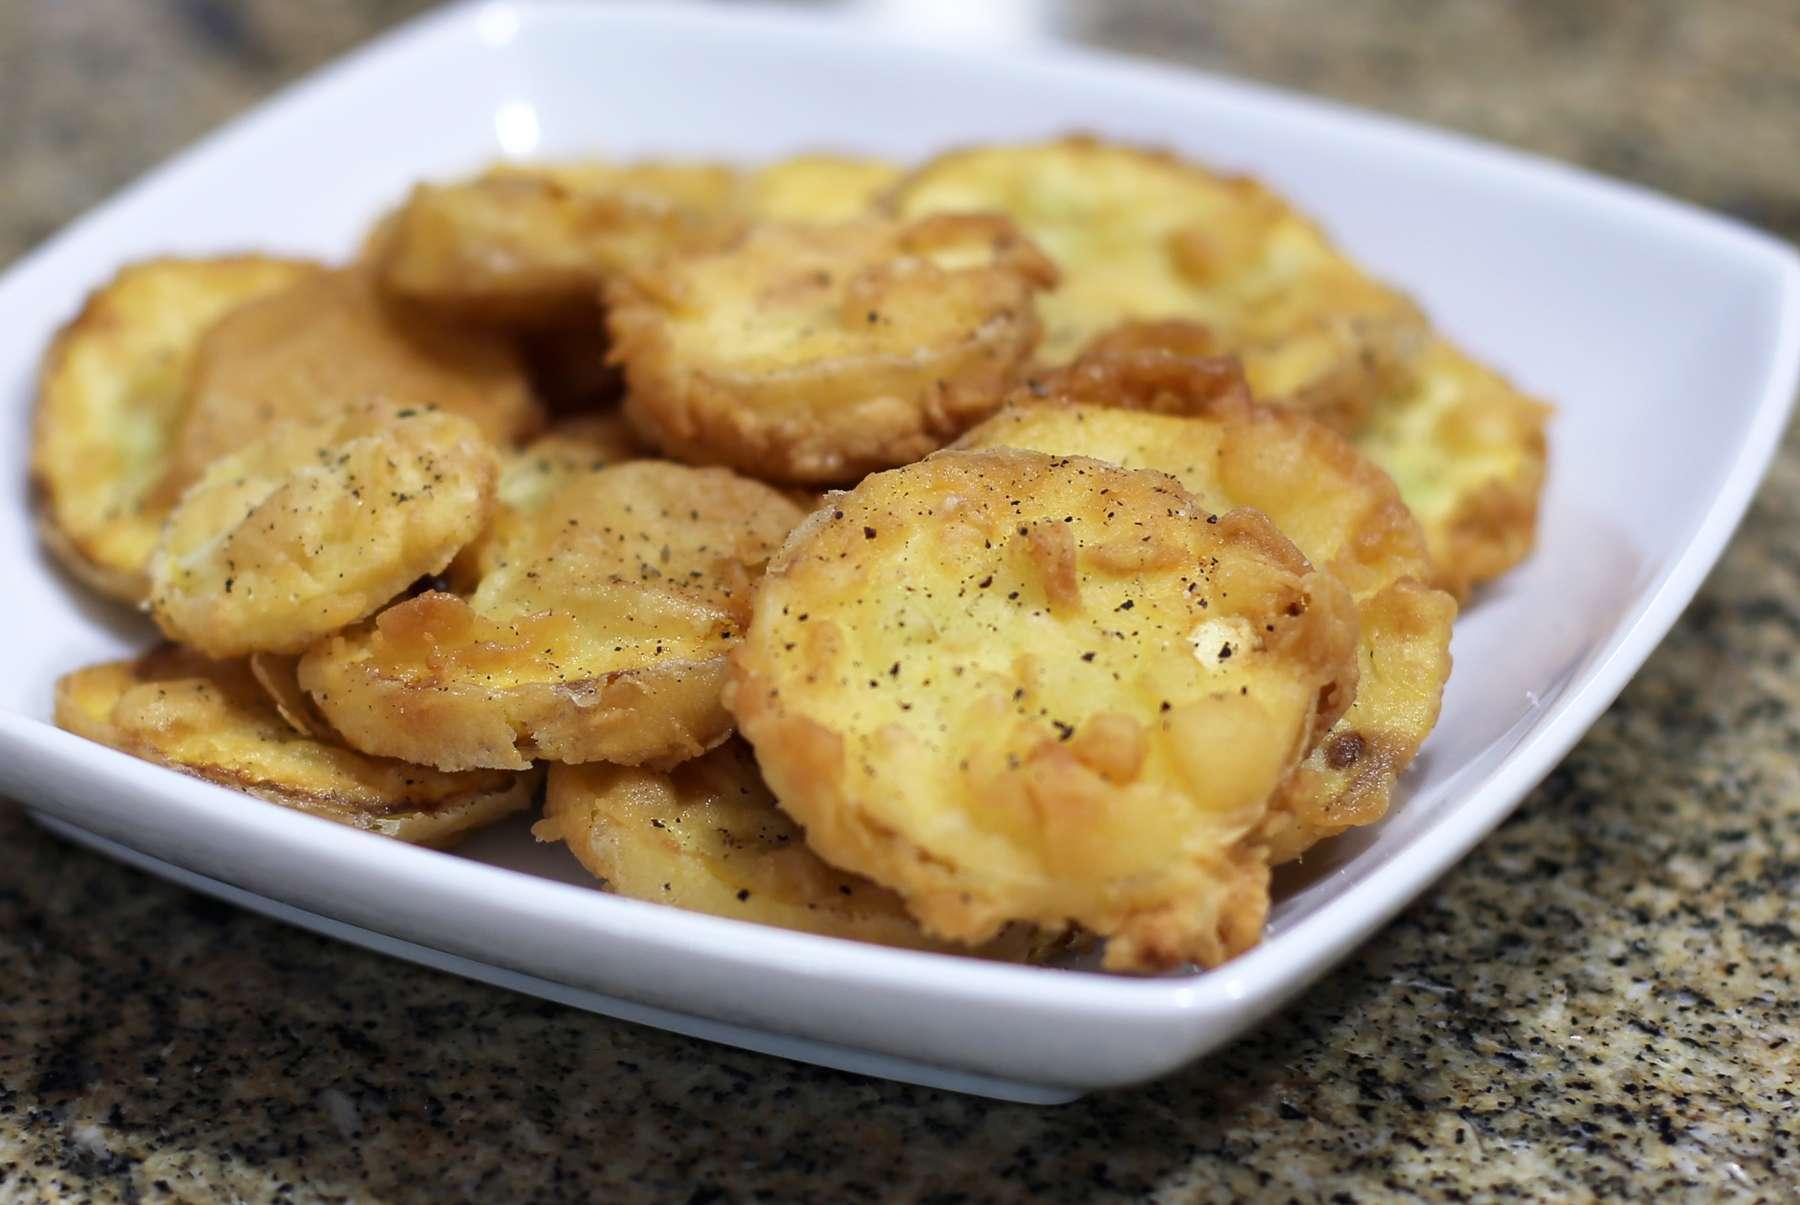 fried-food-pakori